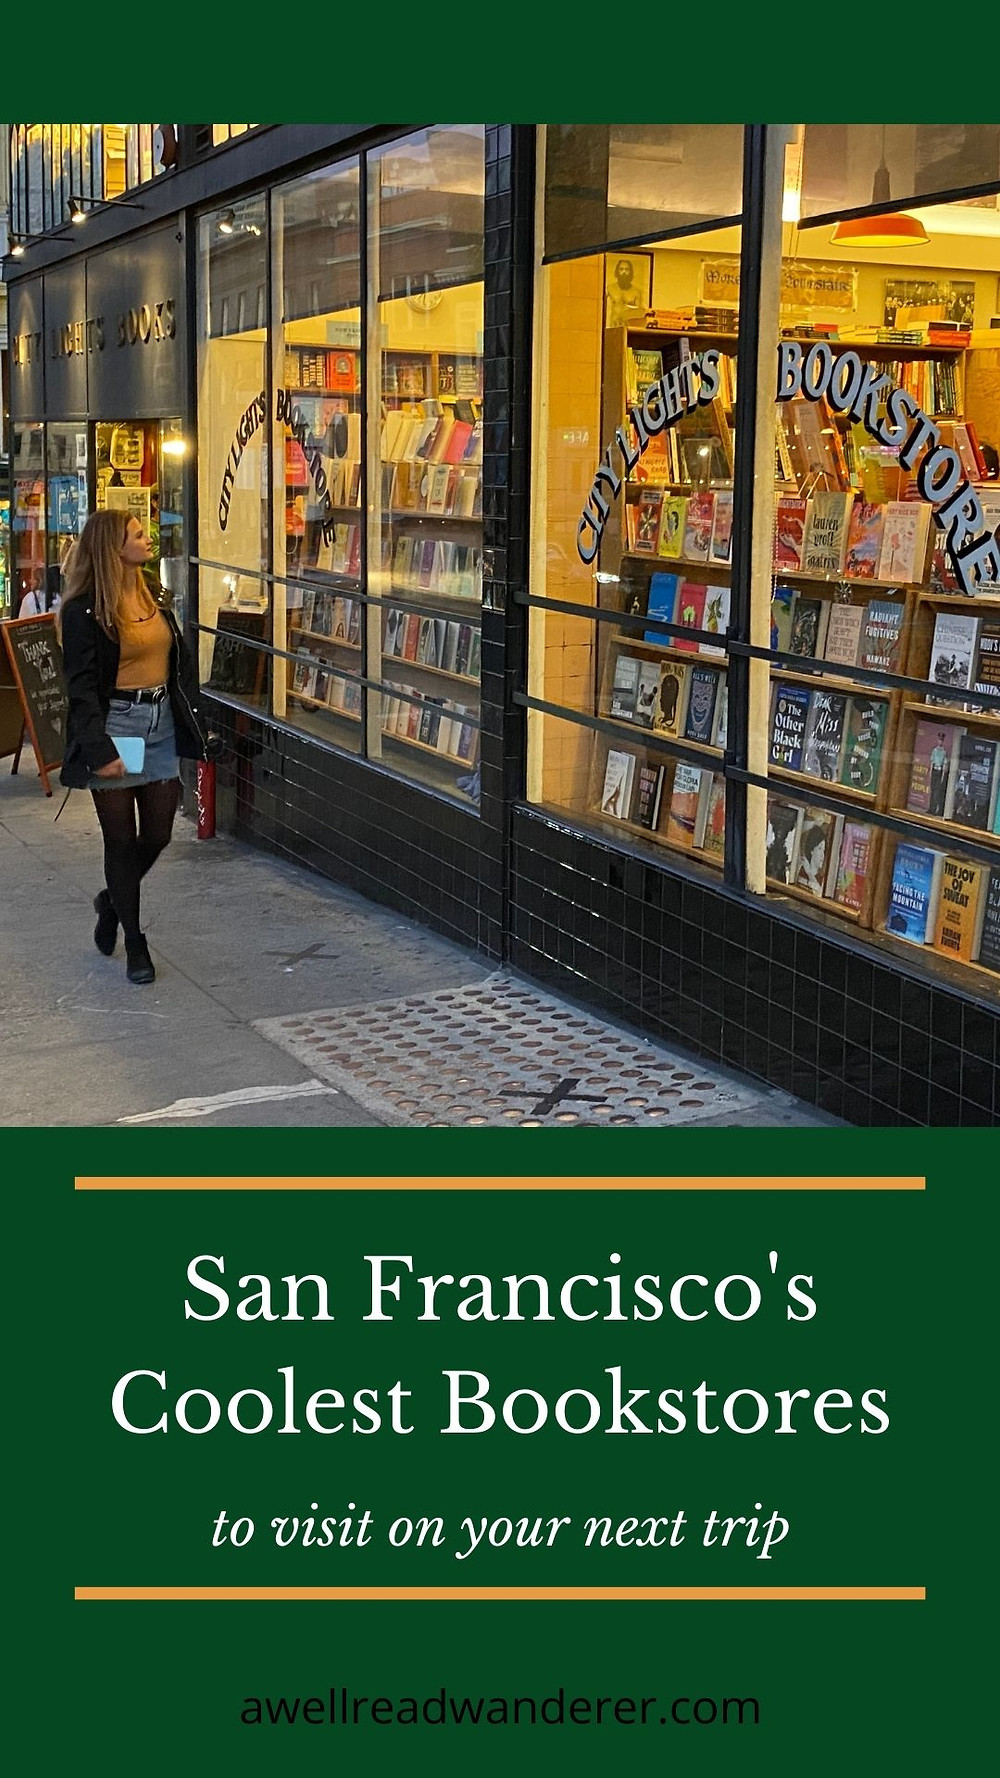 San Francisco bookstores City Lights bookstore history